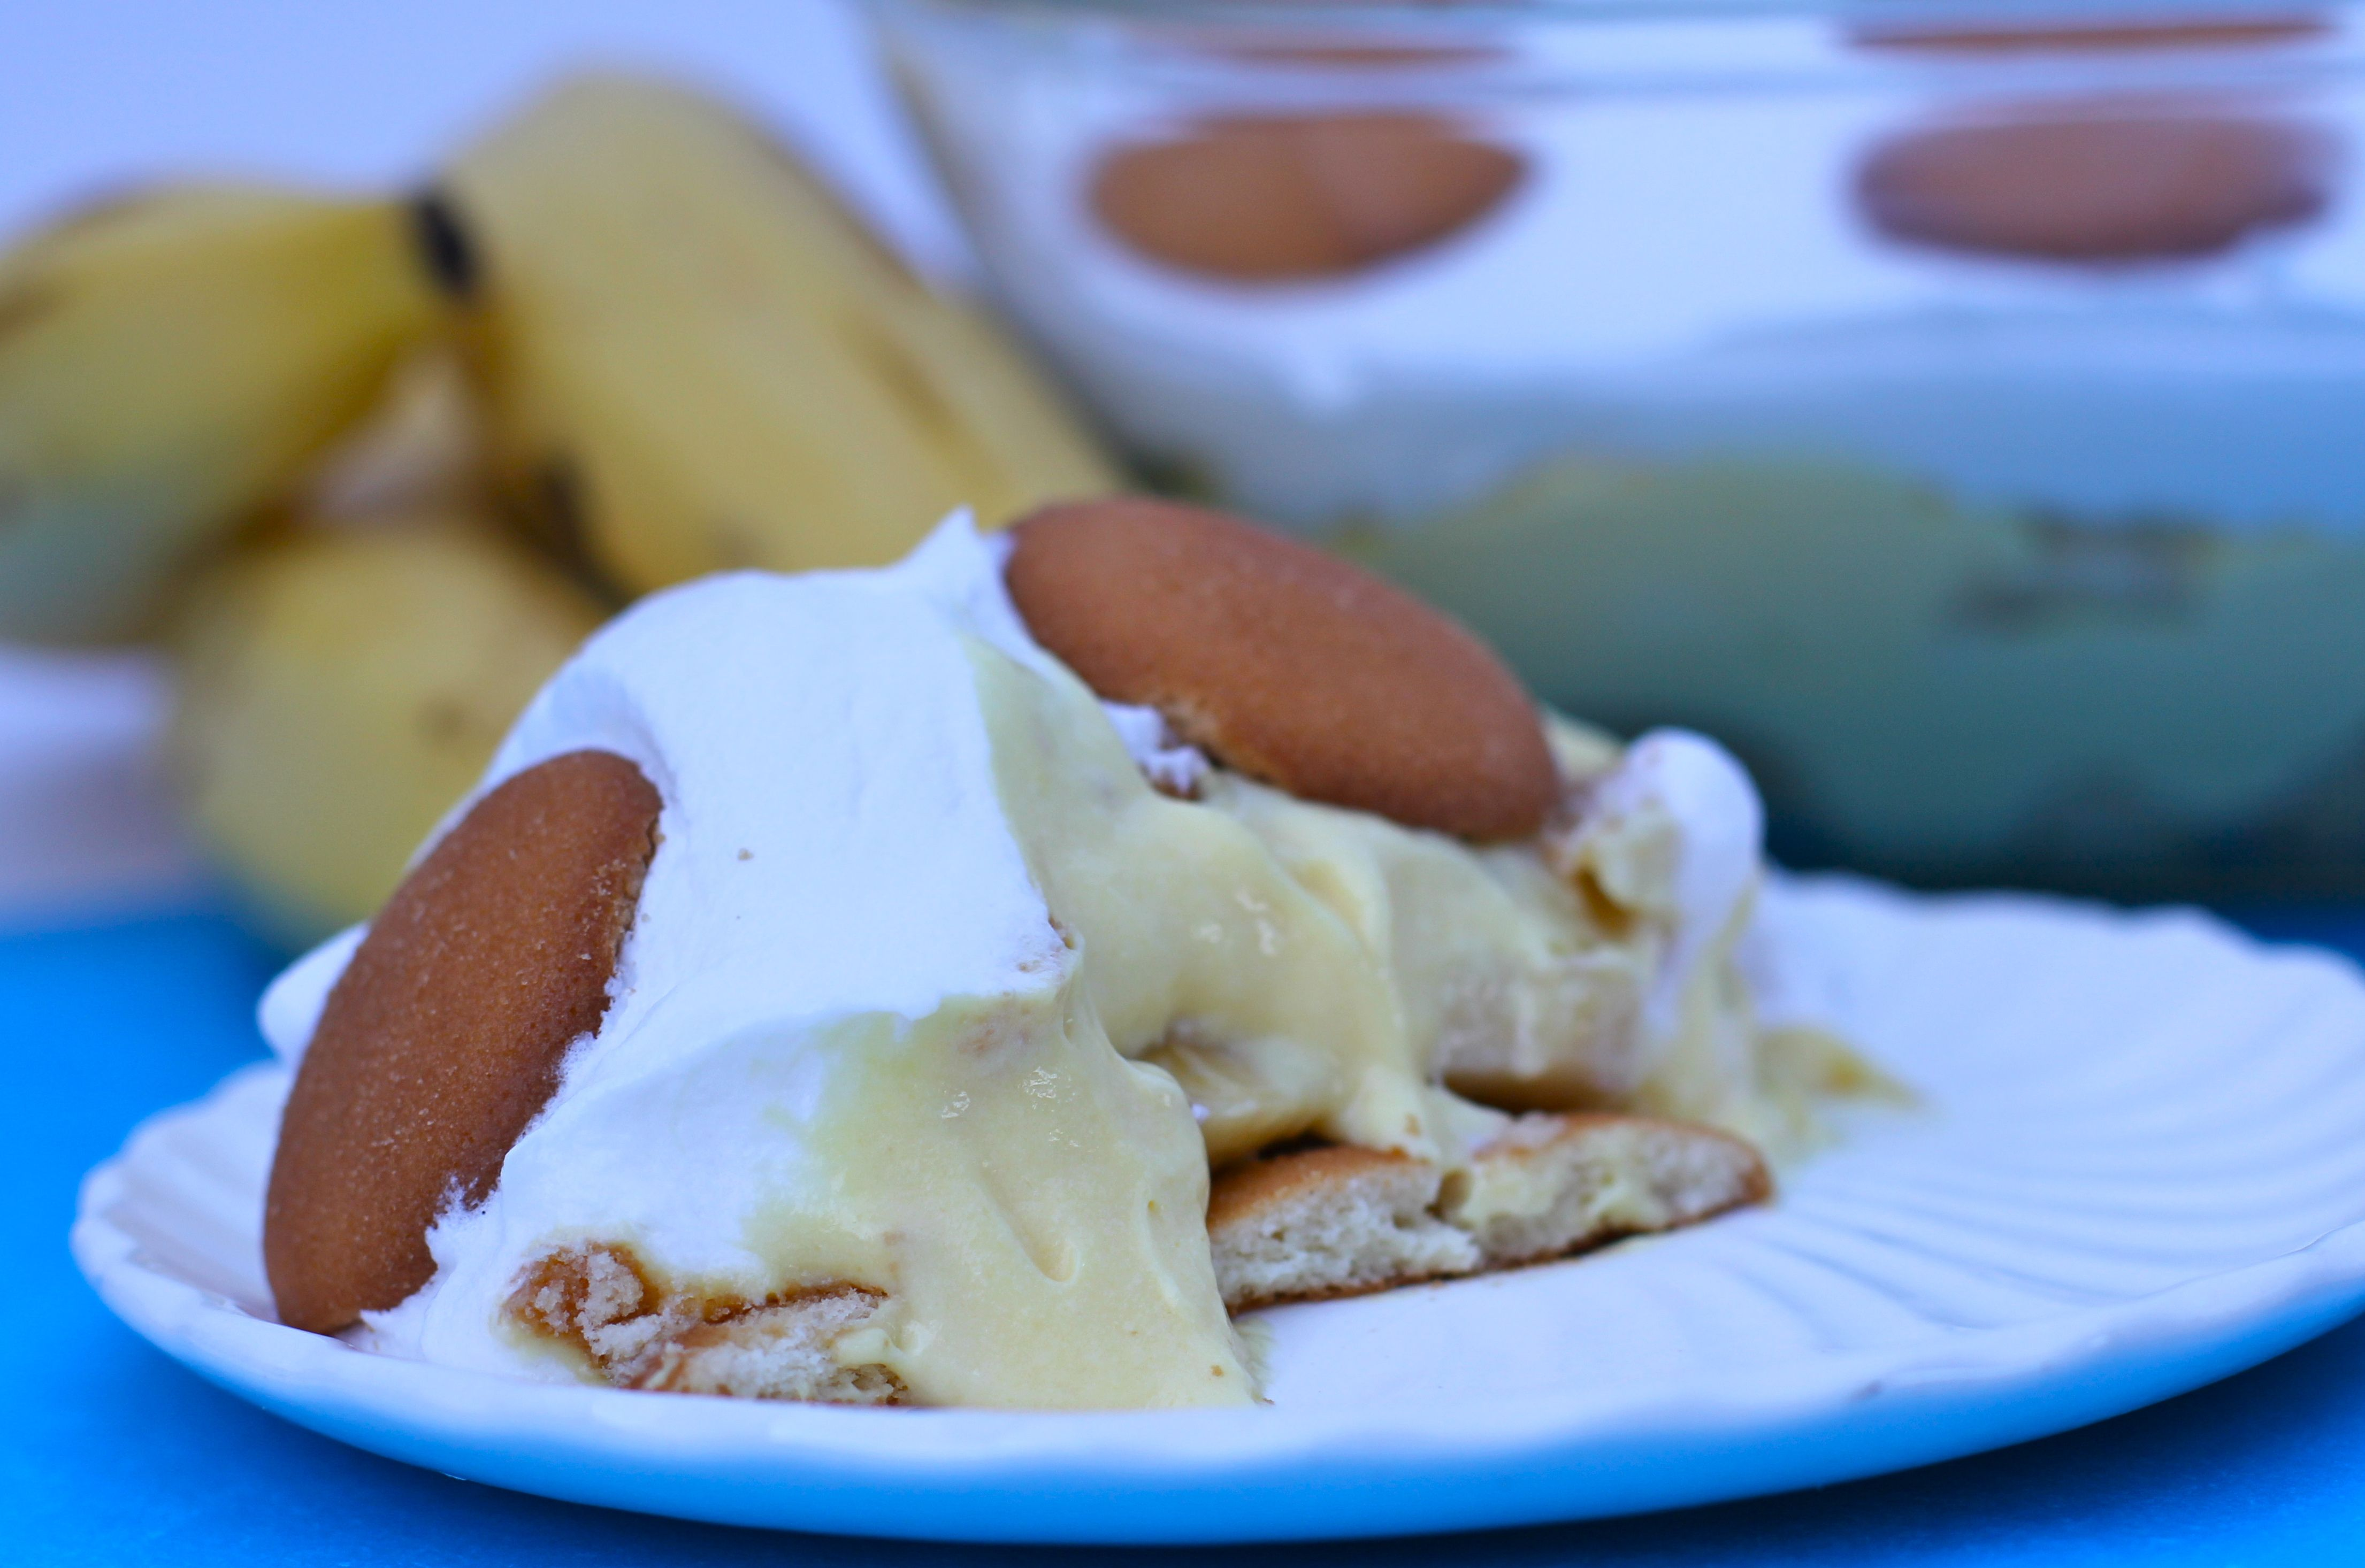 Easy Banana Pudding Easy Banana Pudding Banana Pudding Recipes Banana Pudding